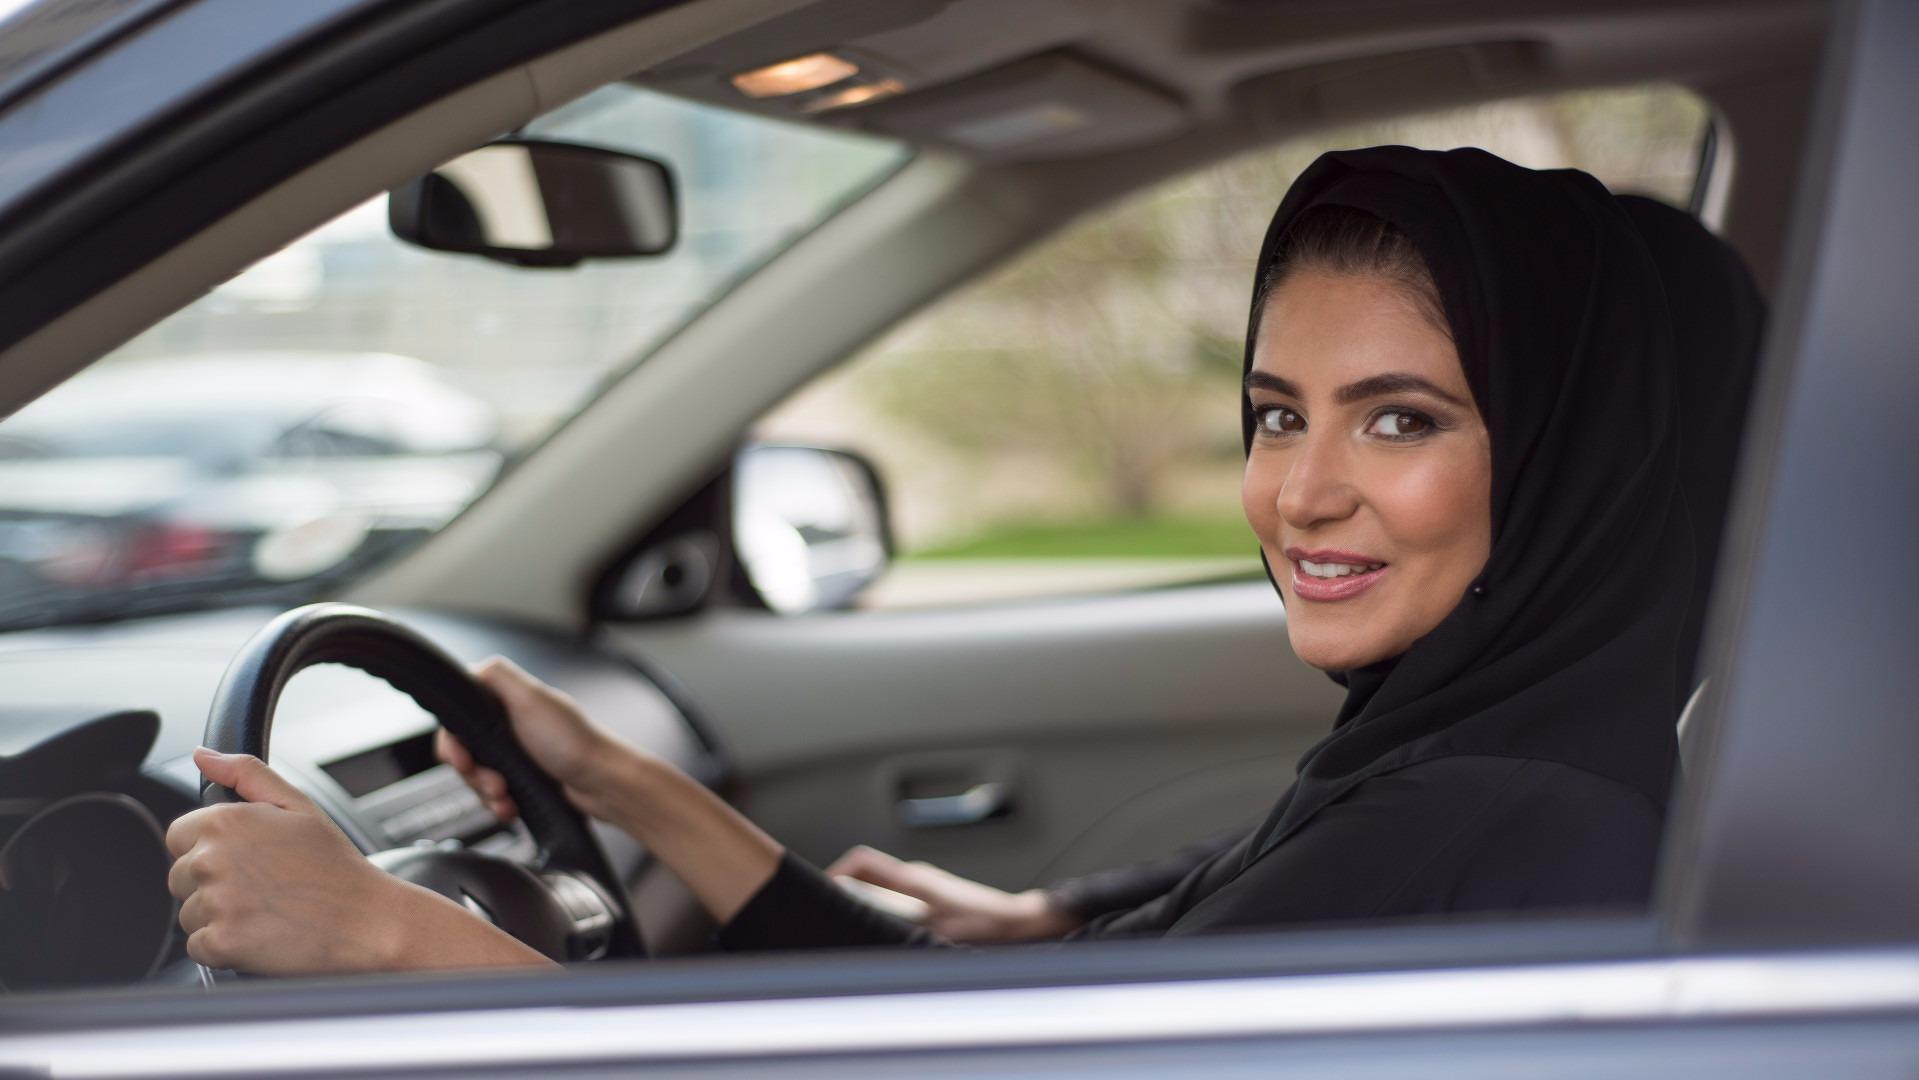 woman driving in saudi arabia essay Saudi arabia says it's ending its ban on women  saudi arabia to end ban on women driving saudi arabia says it's ending its ban on  as a woman, i.